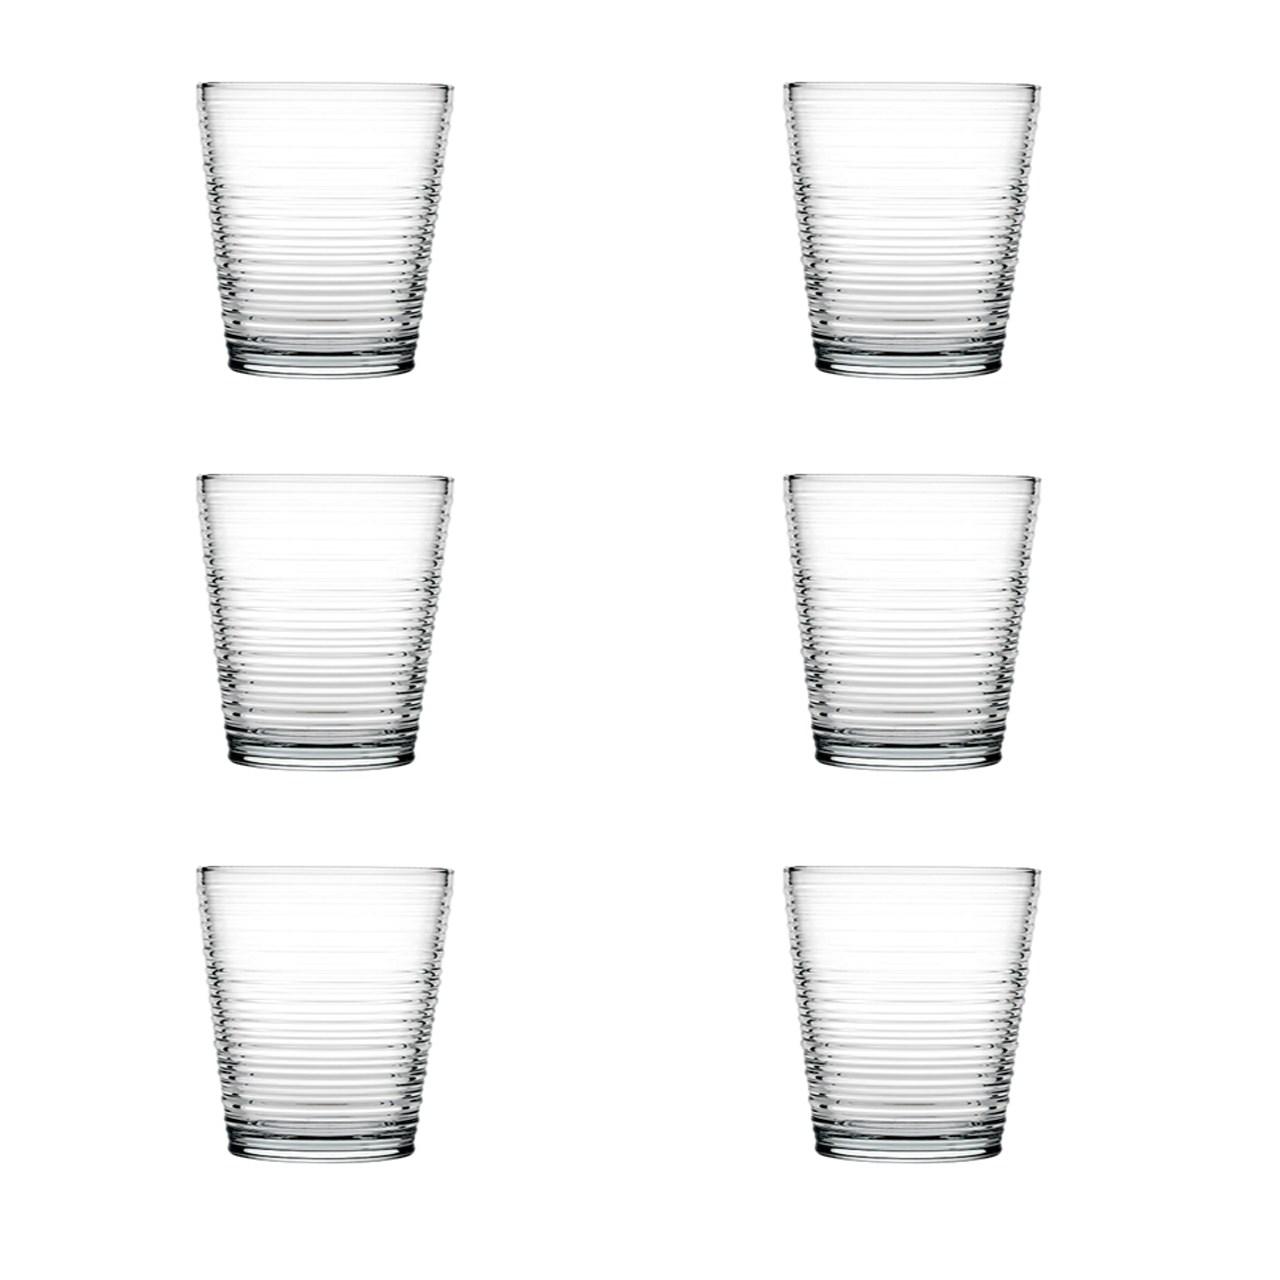 لیوان پاشاباغچه سری گرانادا کد 420124 بسته 6 عددی